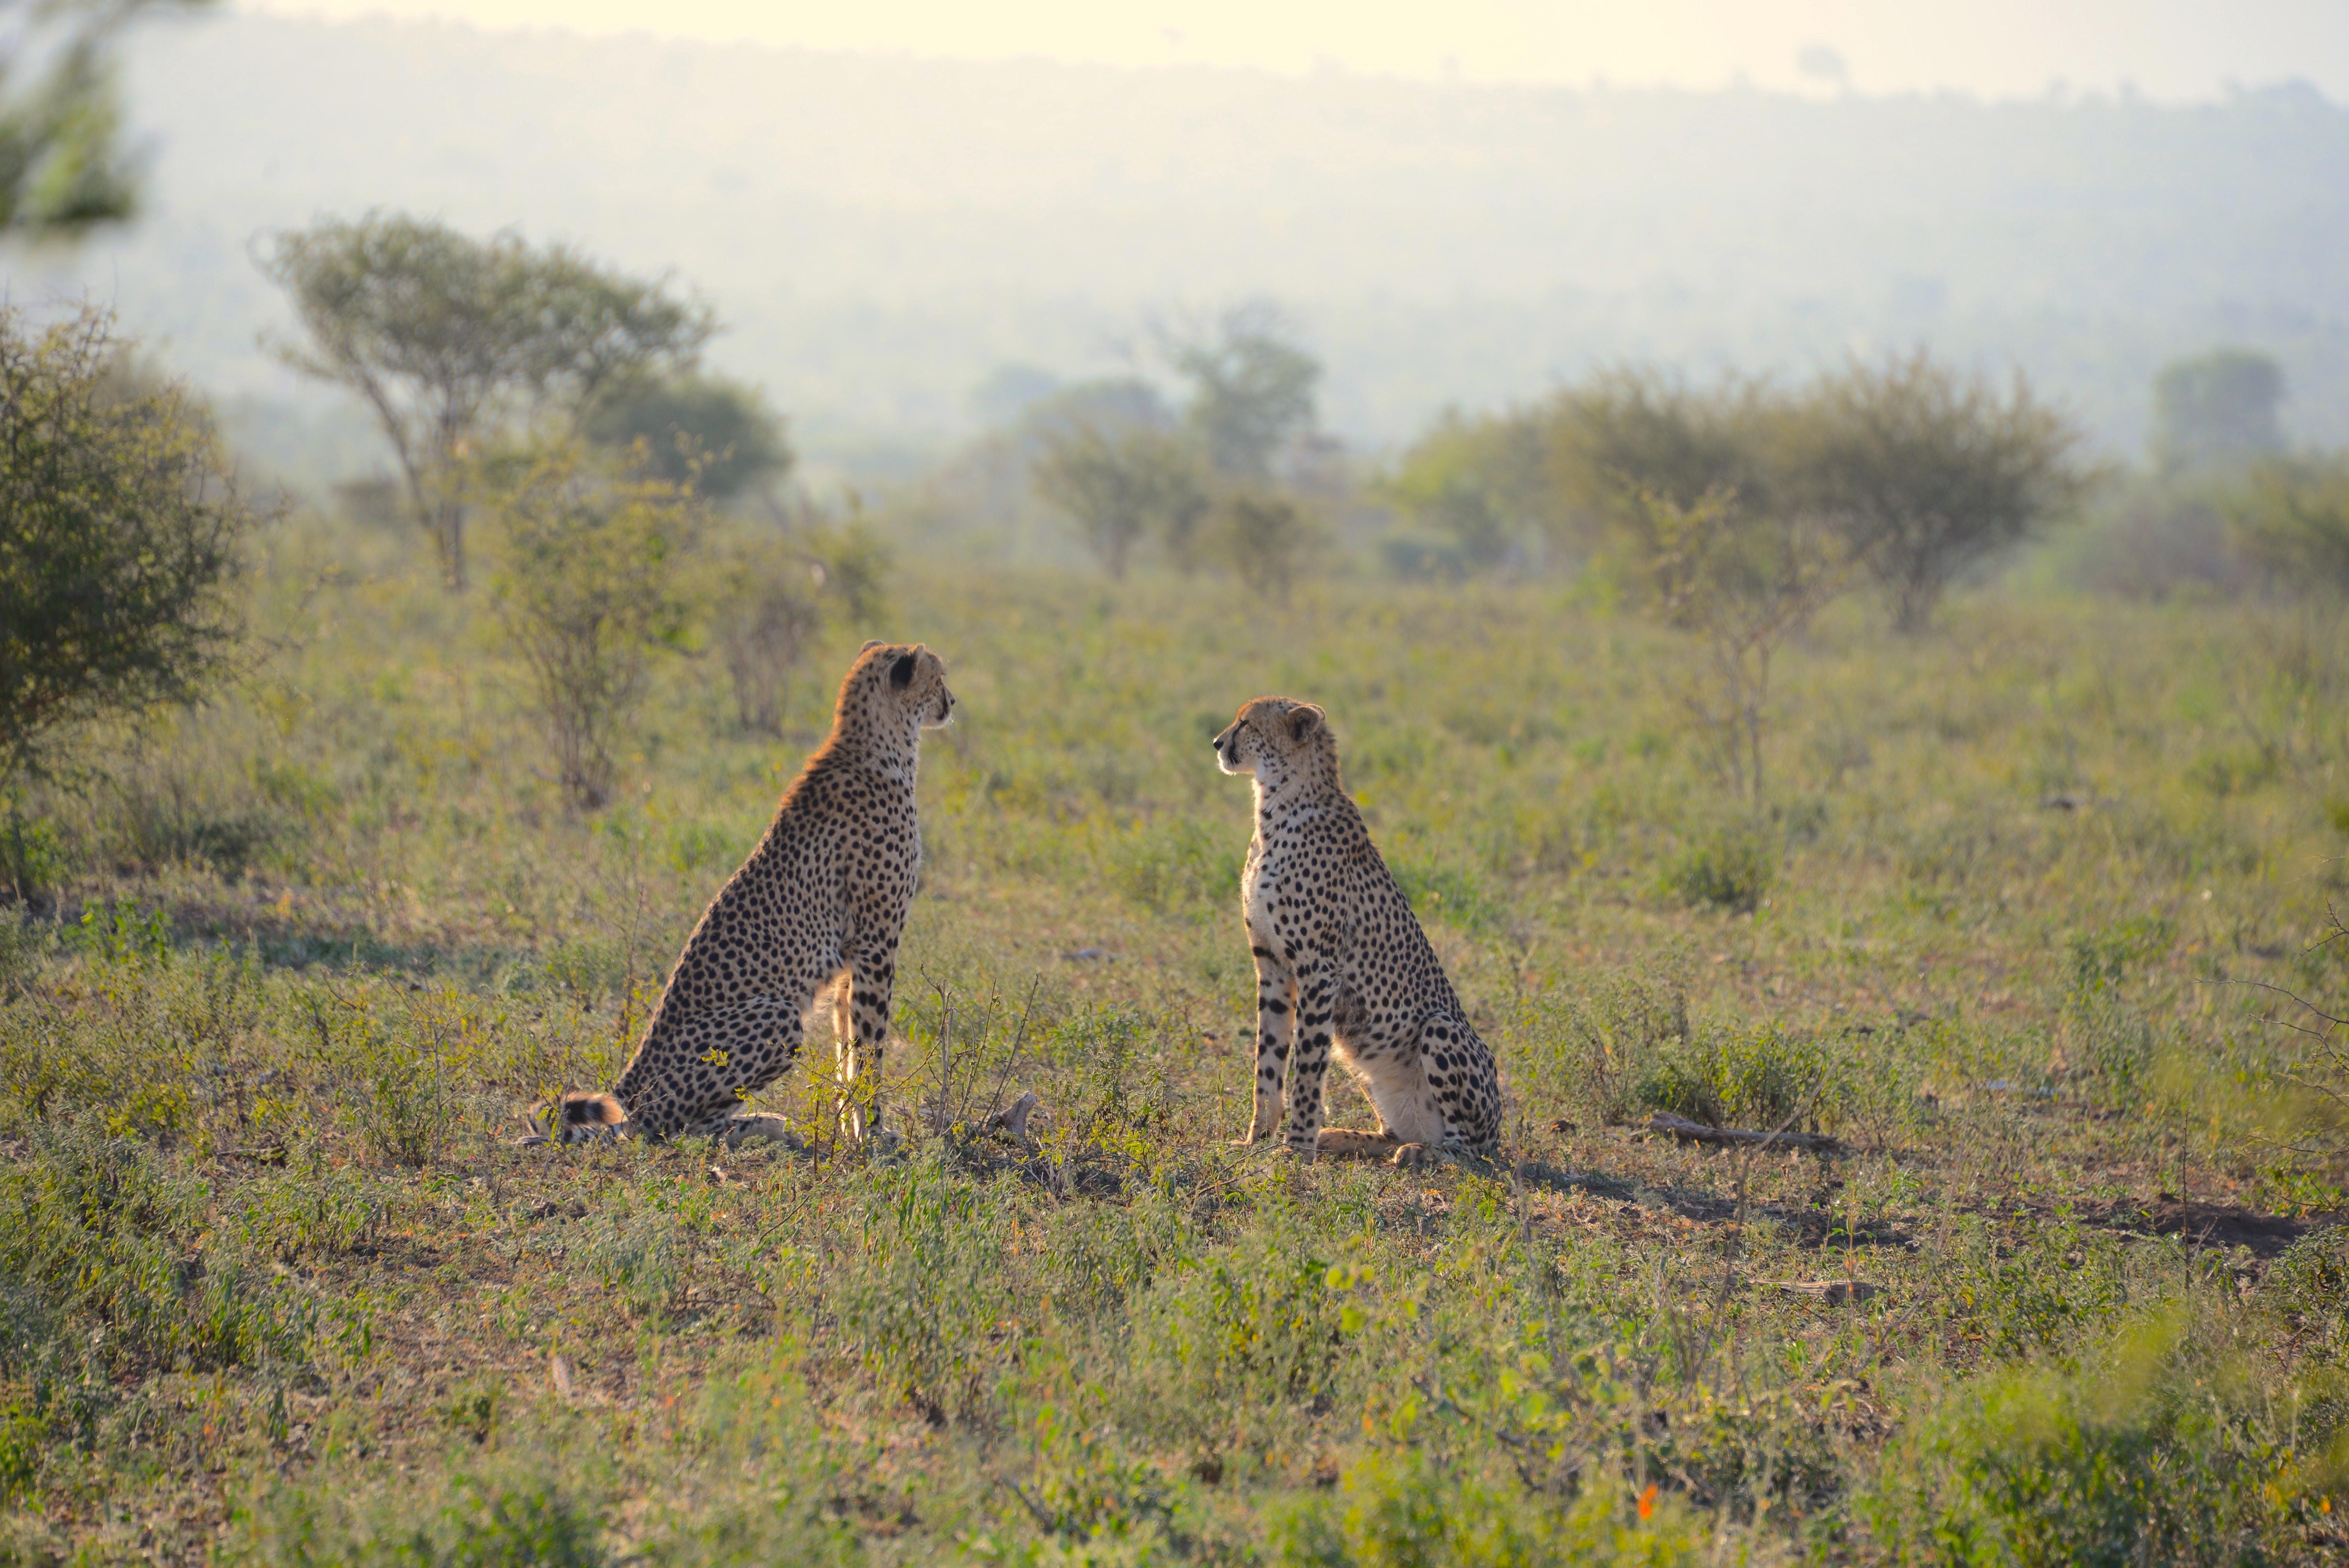 two cheetahs sitting on green grass field